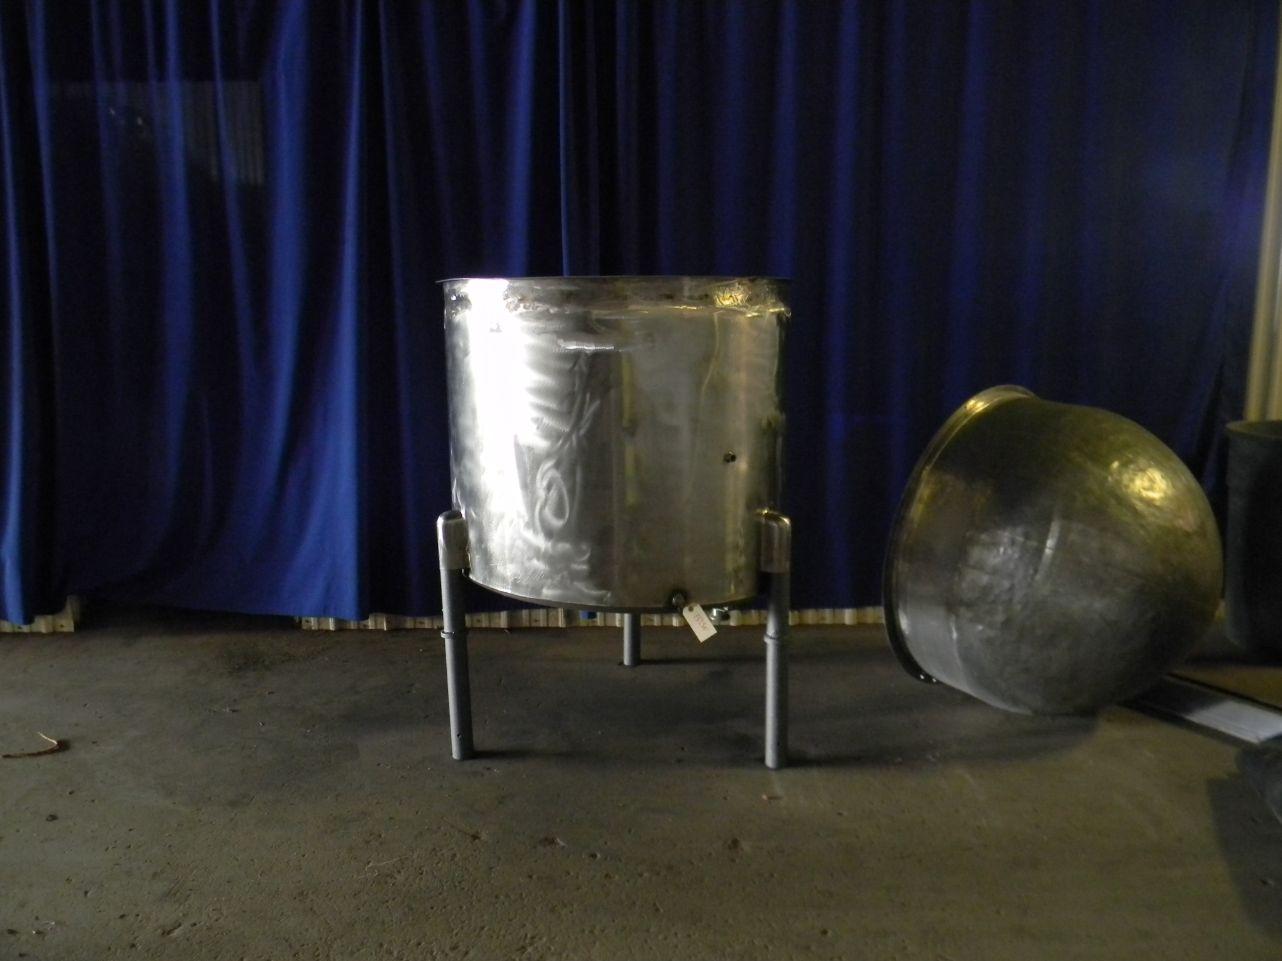 185 Gallon Single Wall Stainless Steel Tank